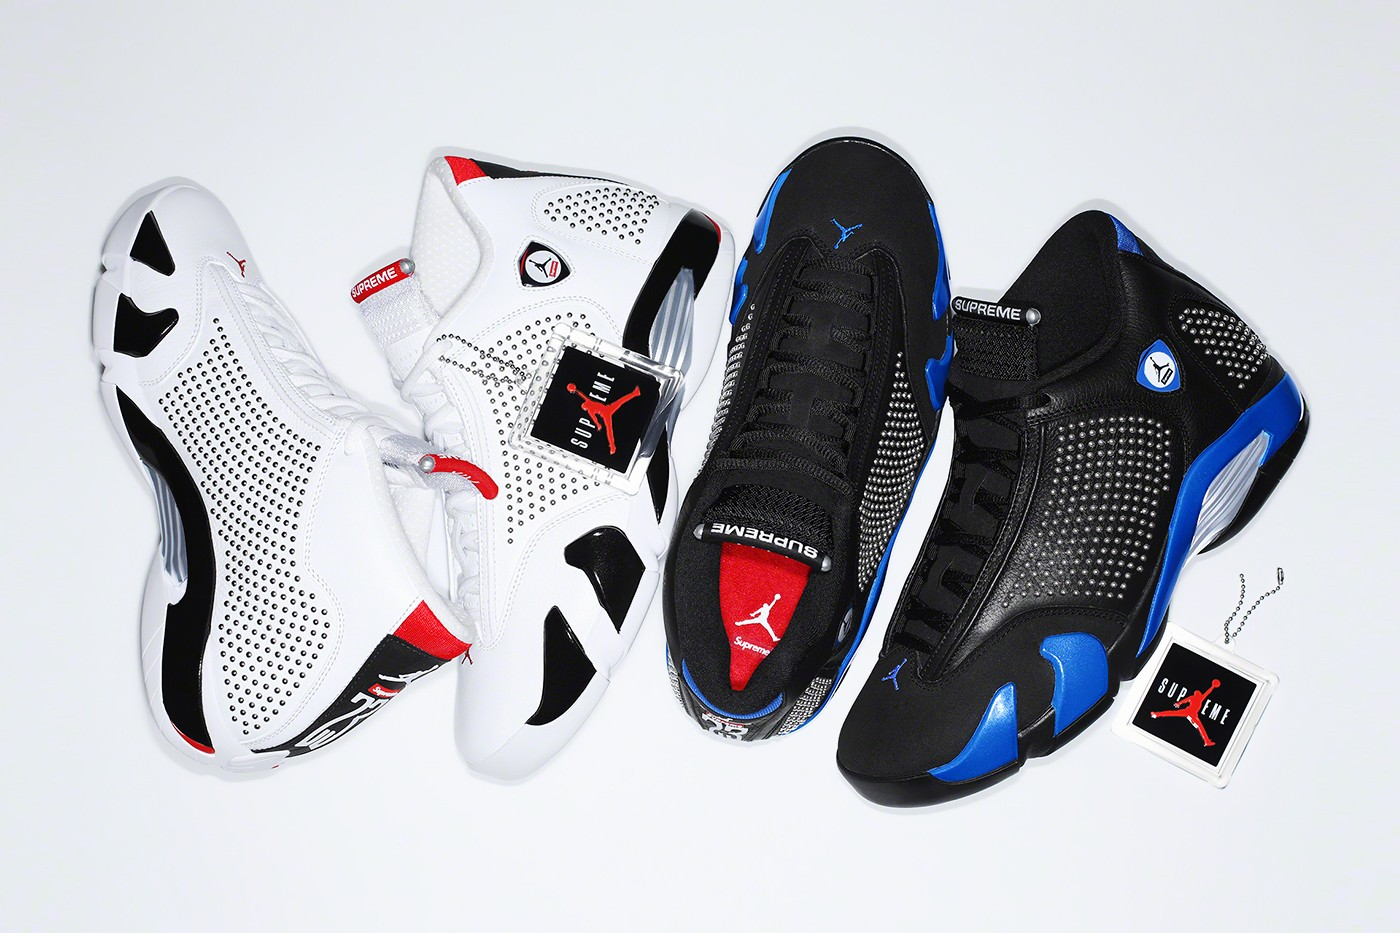 Supreme x Air Jordan XIV Official Look